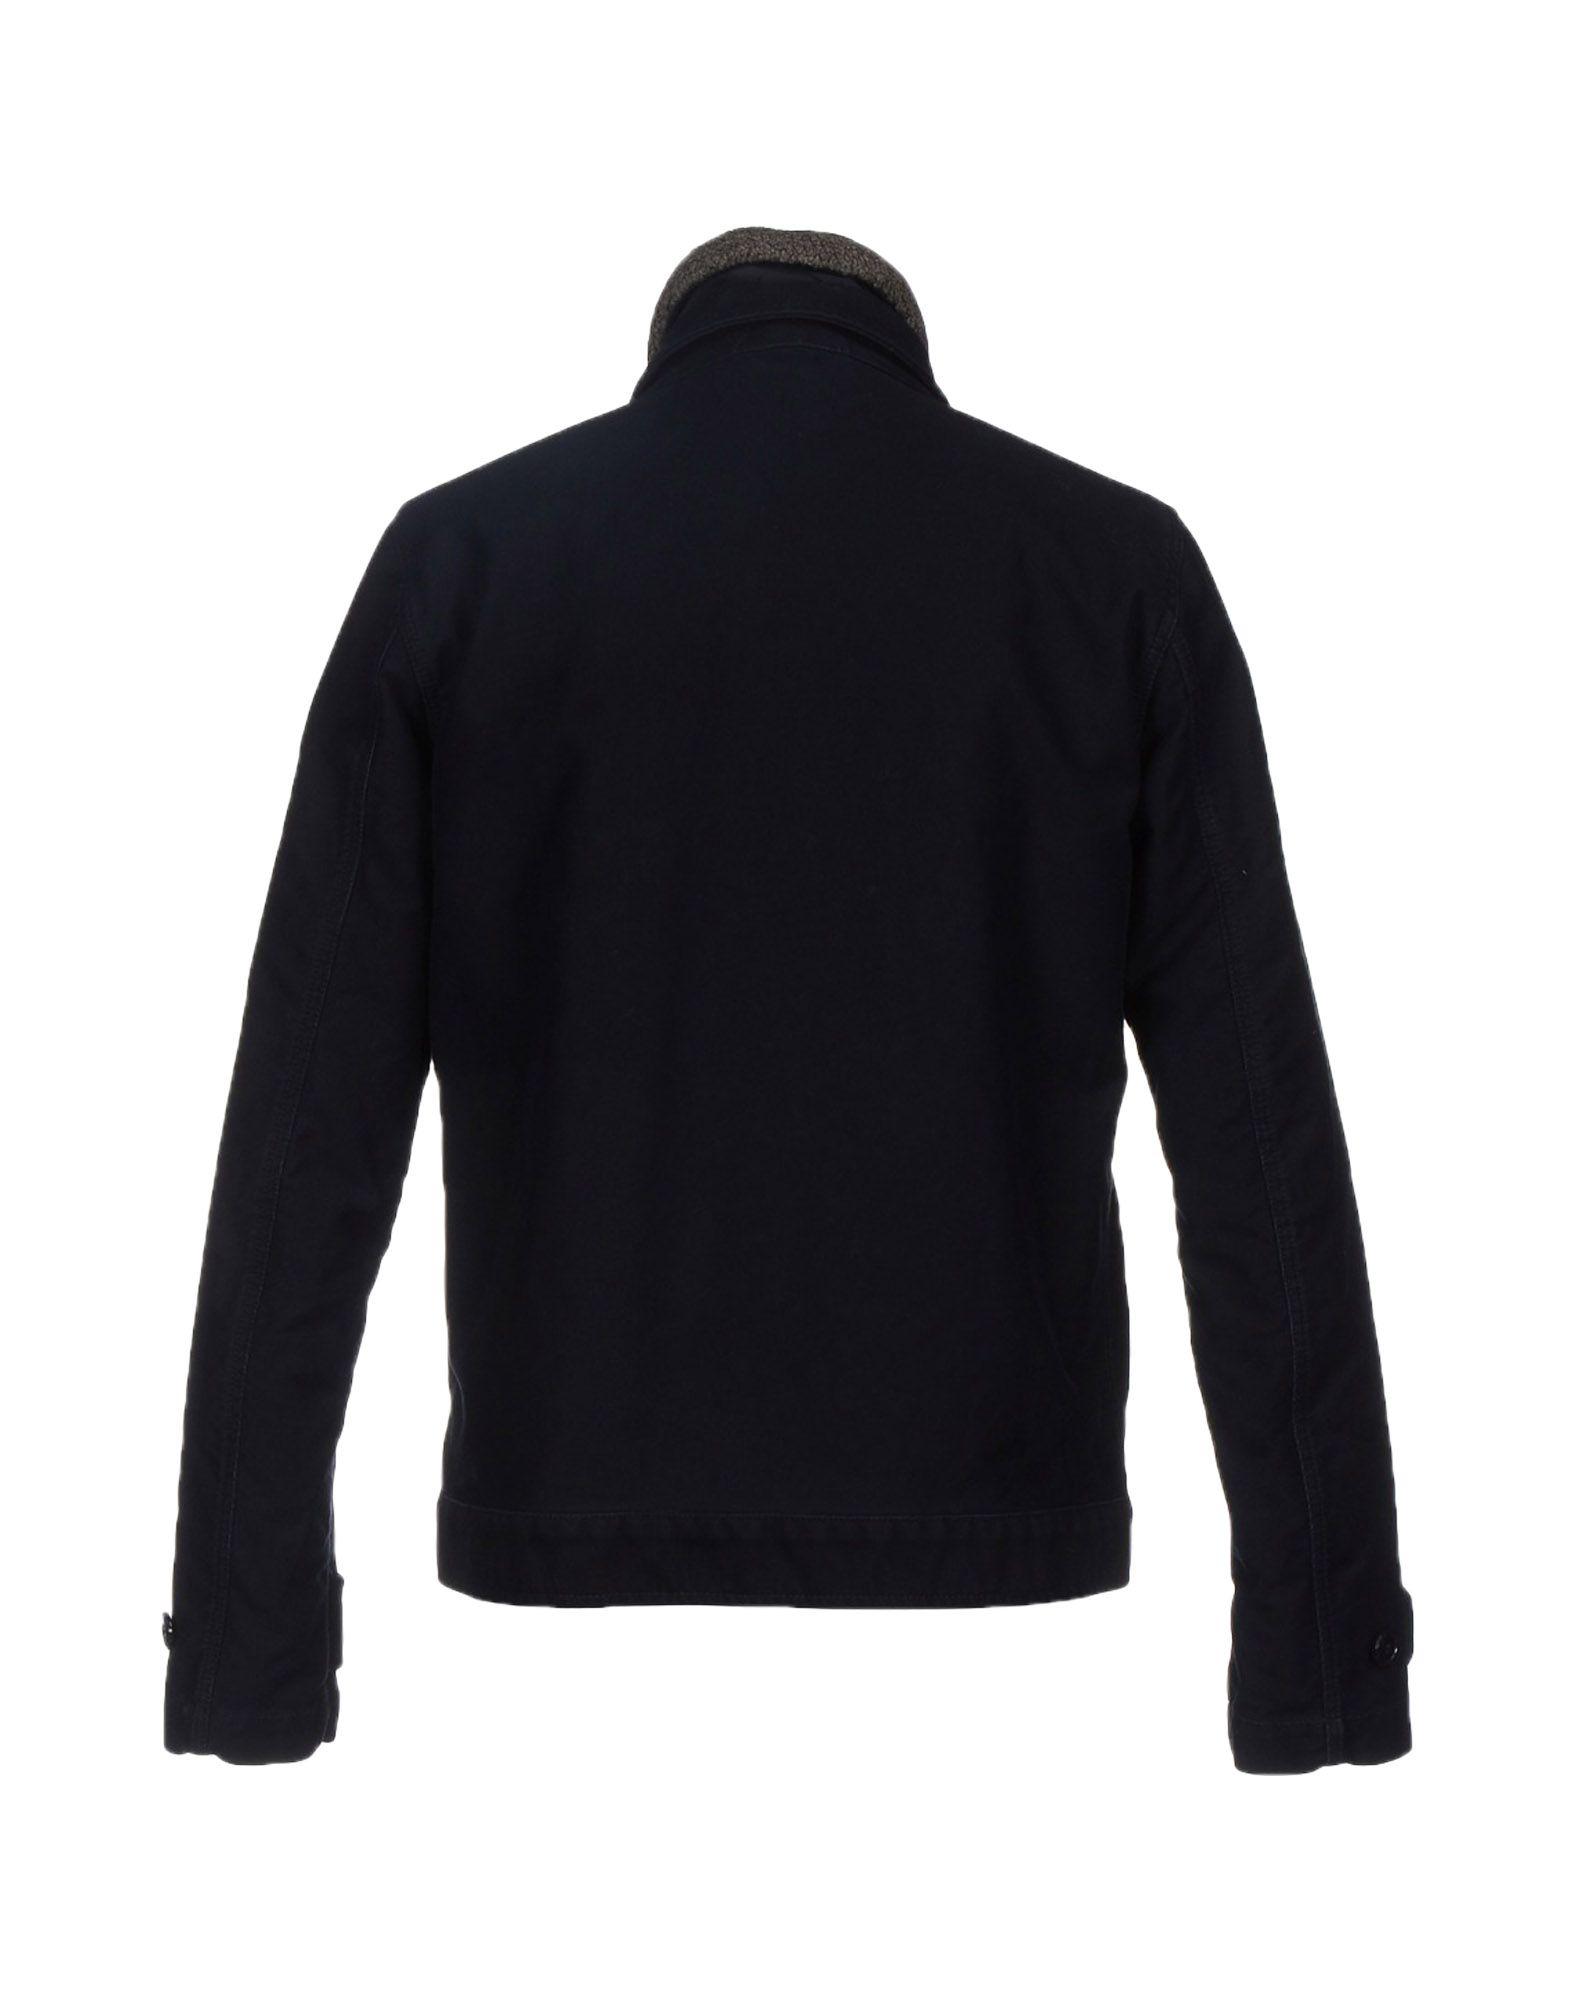 Aspesi Cotton Jacket in Dark Blue (Black) for Men